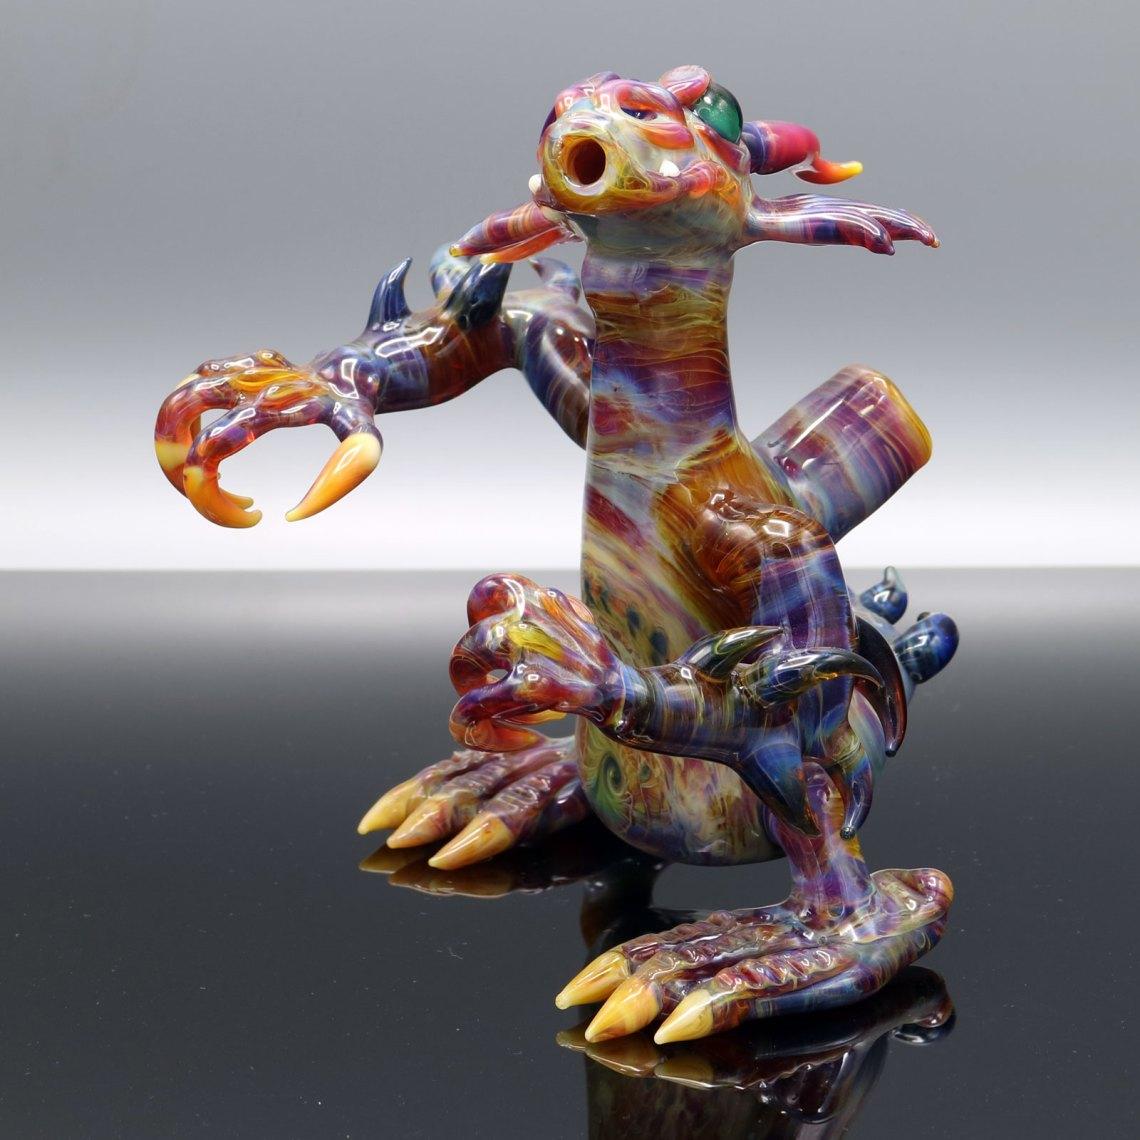 B-Hold X Broka Collab – Floki the Dragon